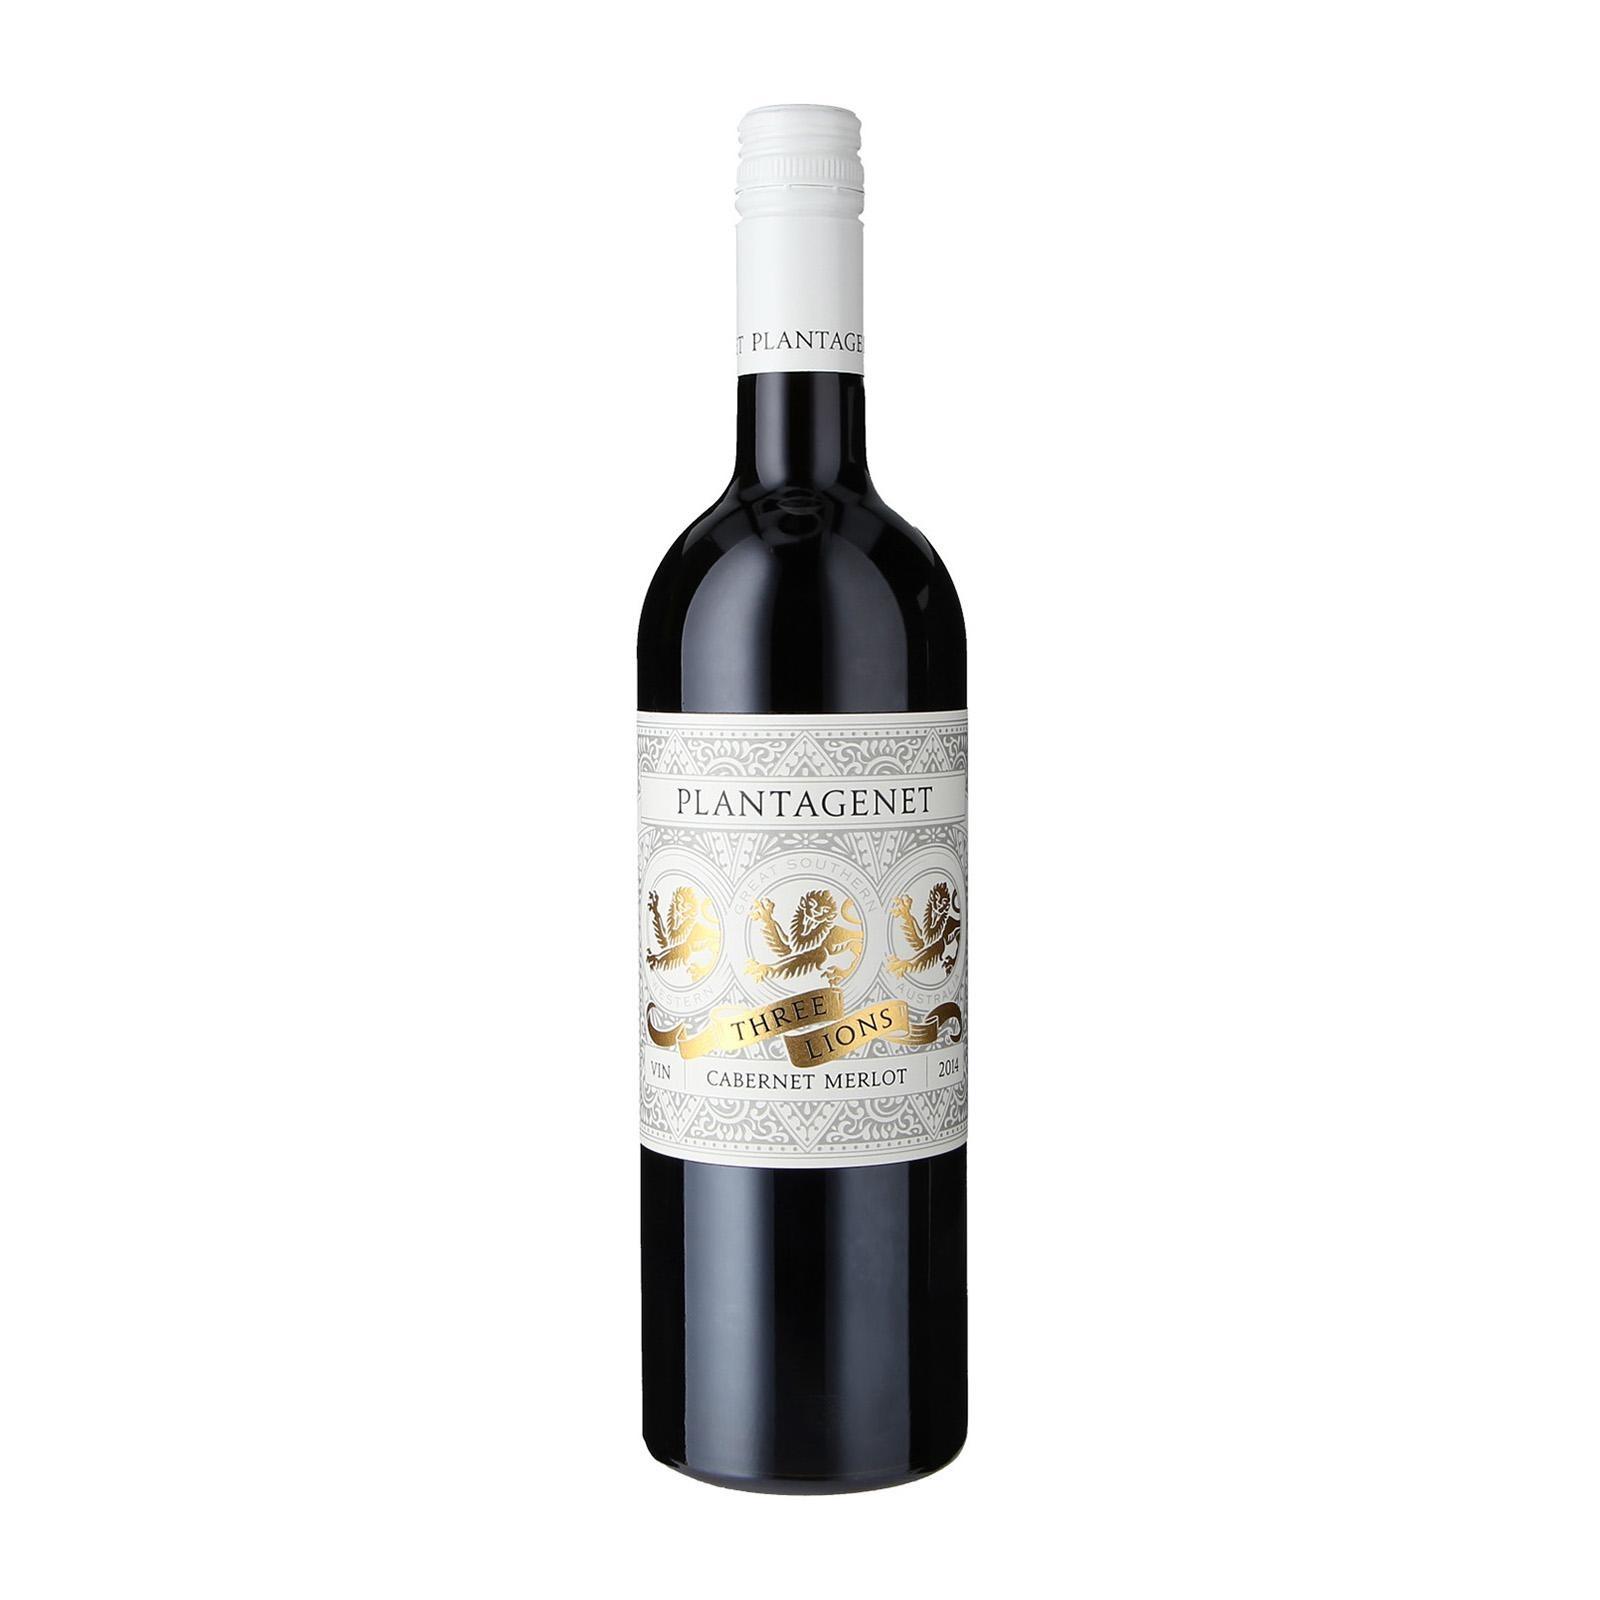 Plantagenet Three Lions Cabernet Merlot-By Culina